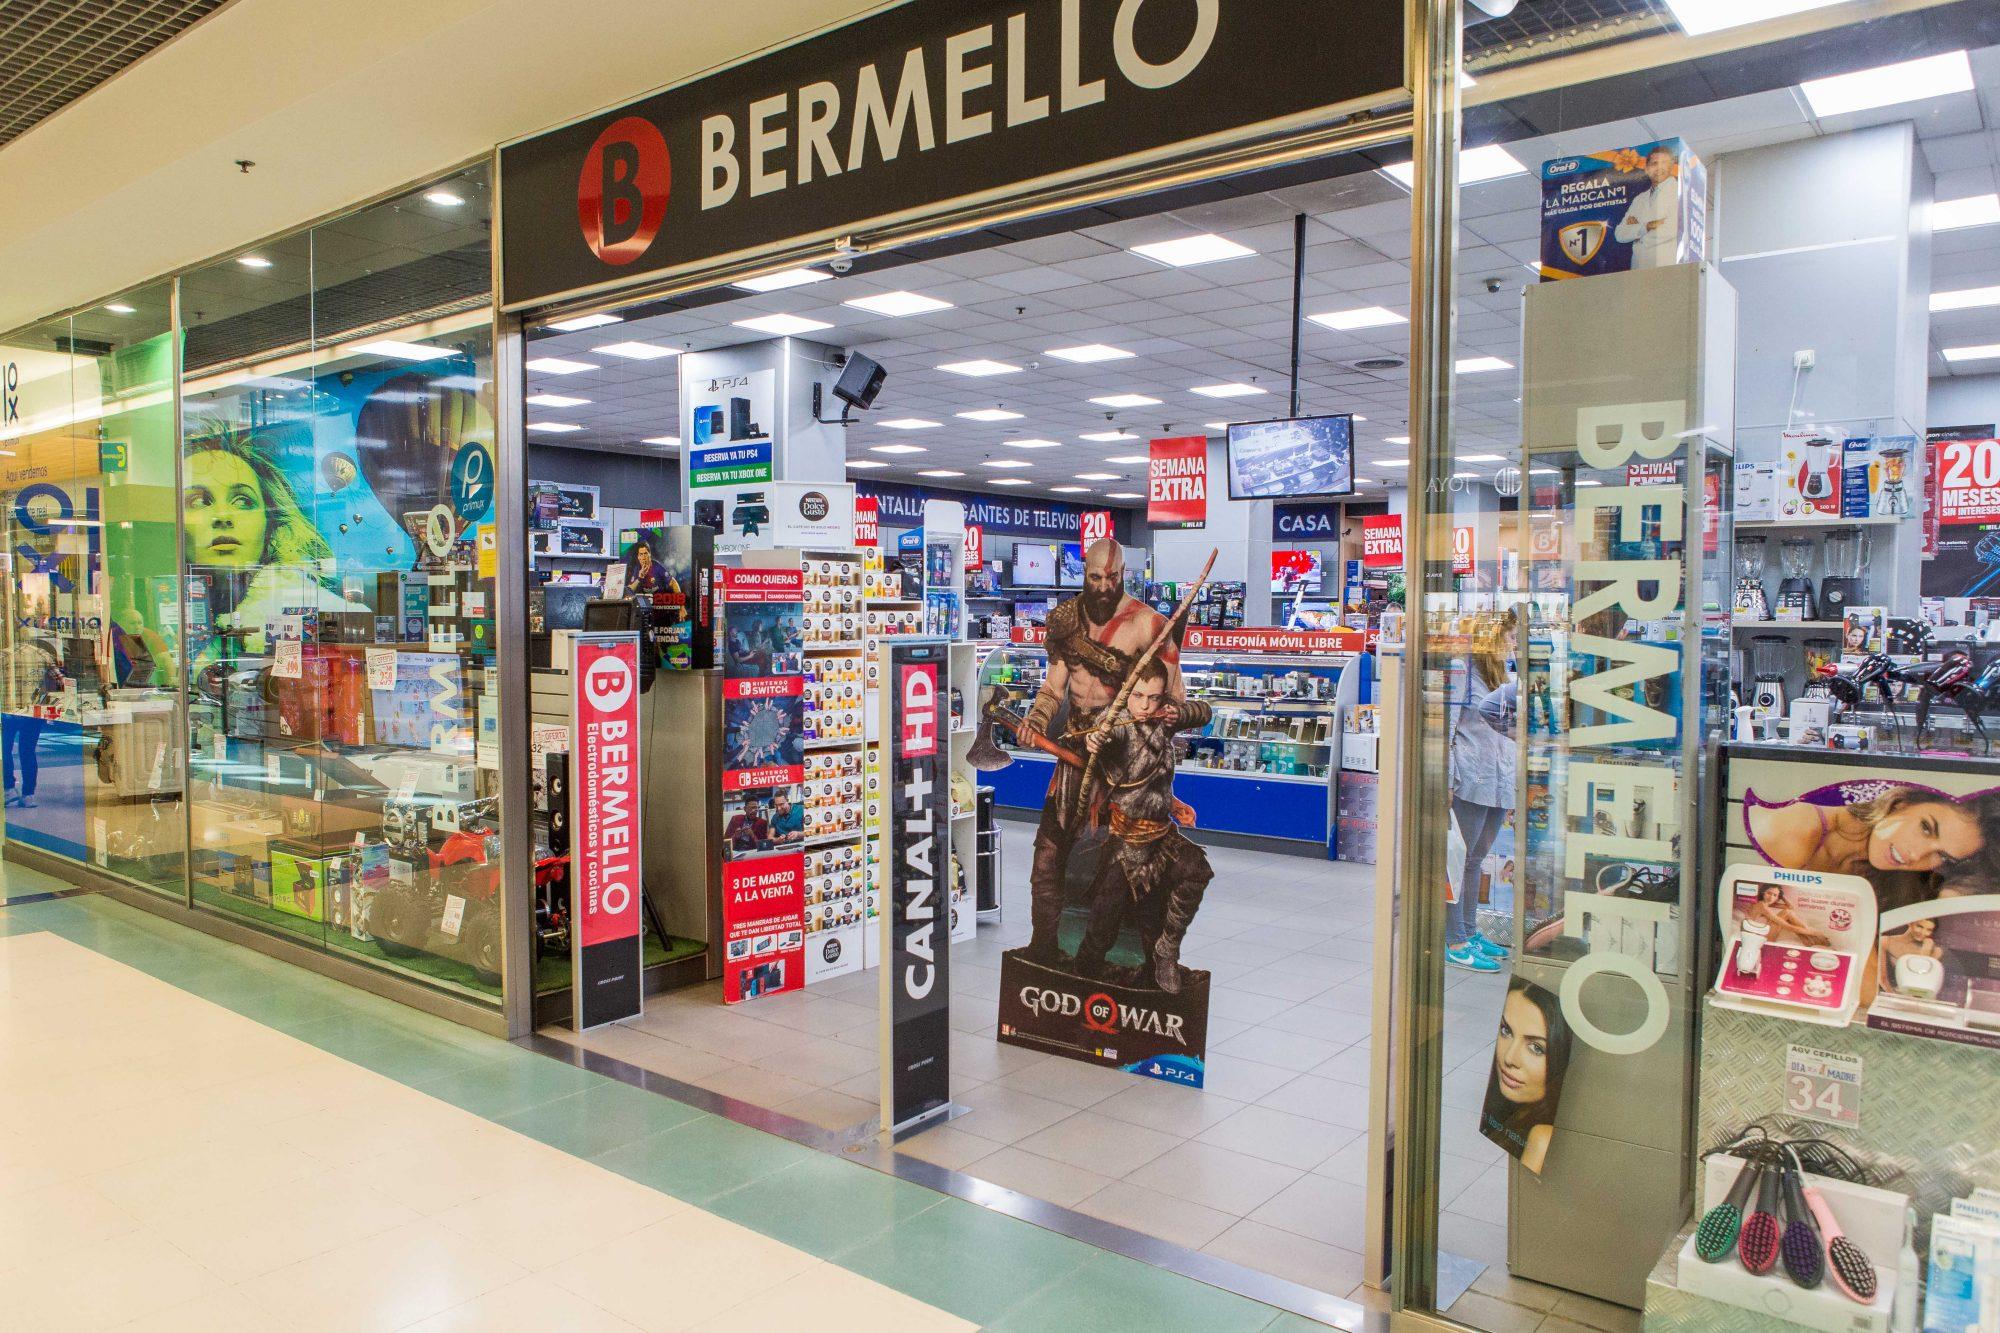 Bermello